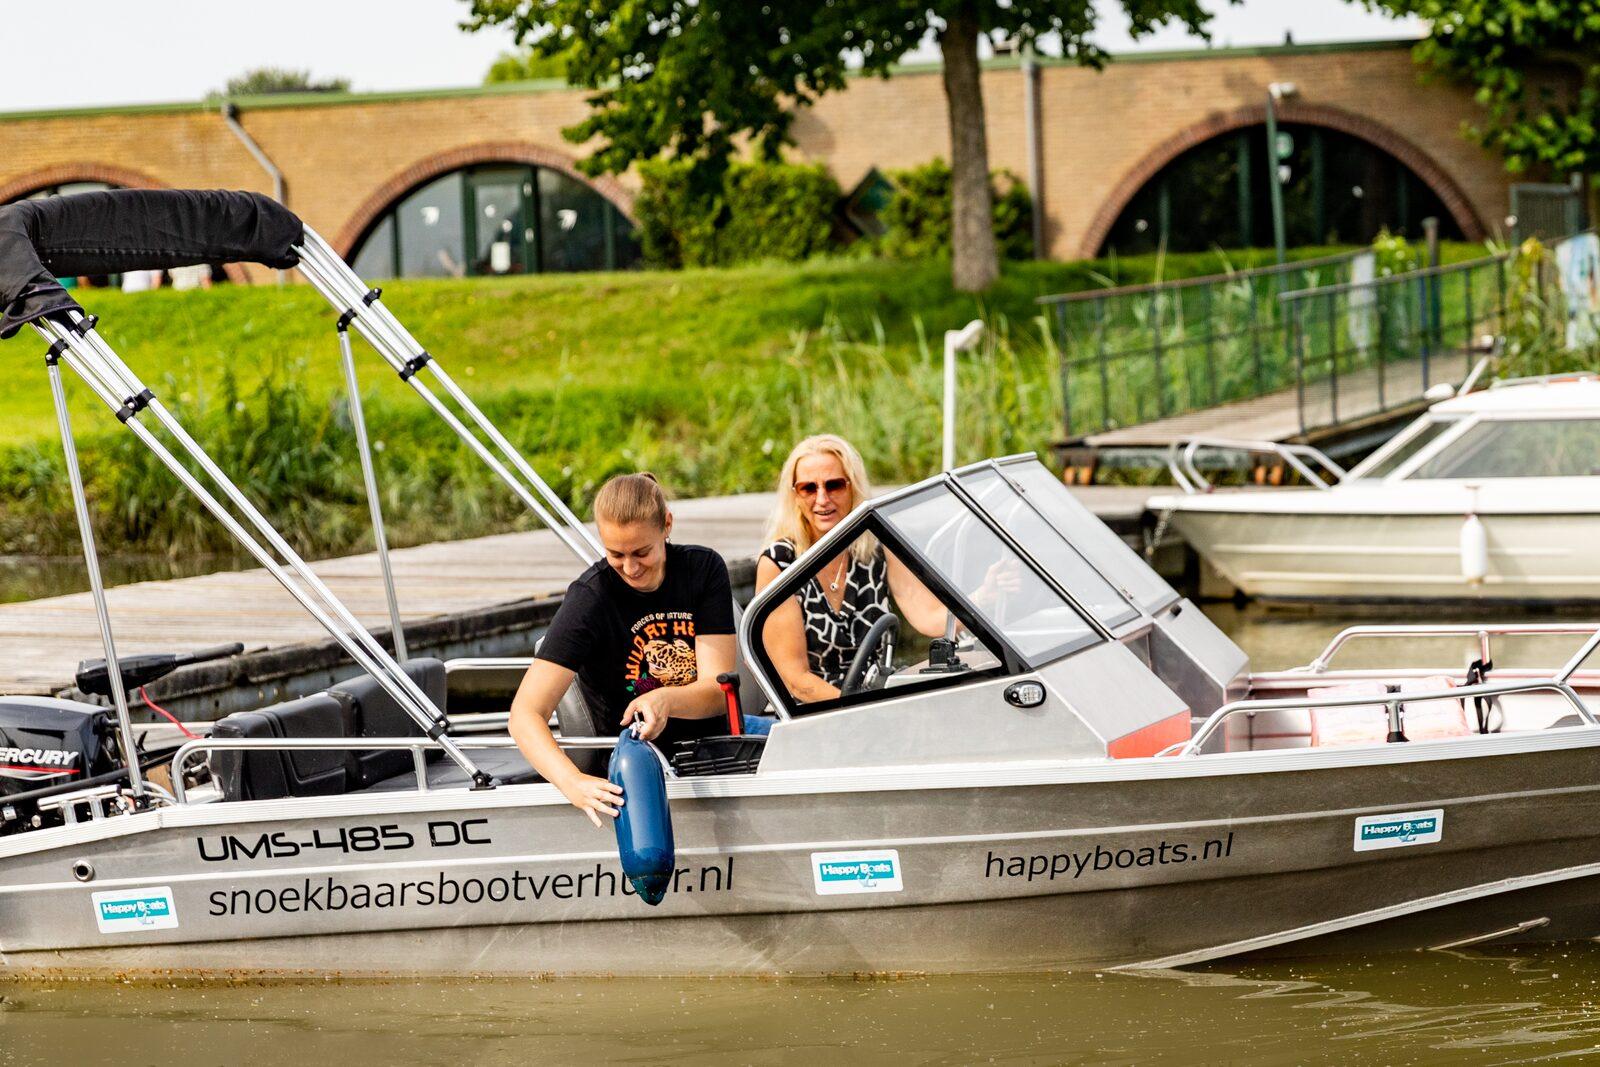 Marina on the IJssel